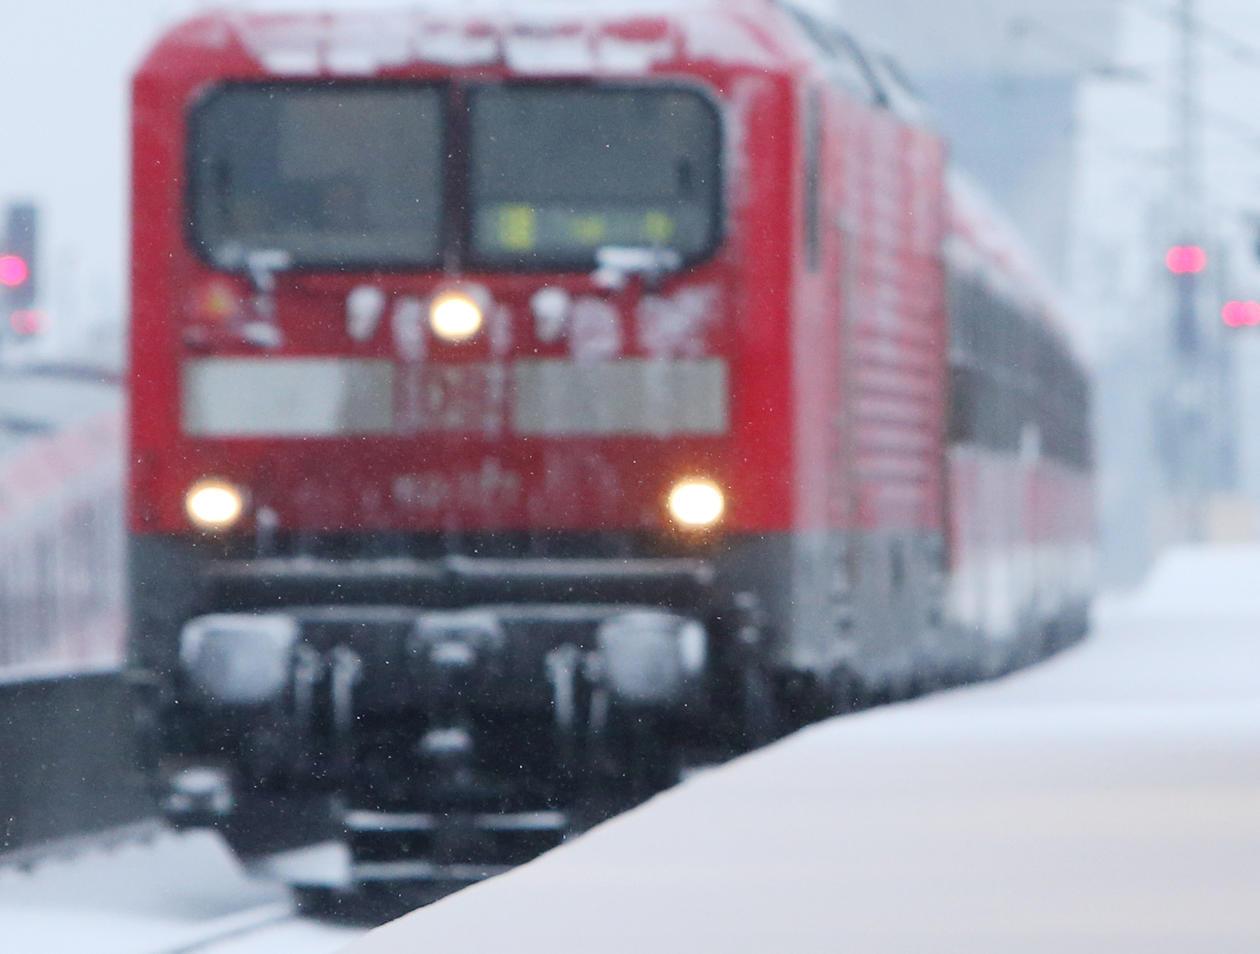 Bahn ärger Zug Nach München Bleibt Liegen Deutsche Bahn